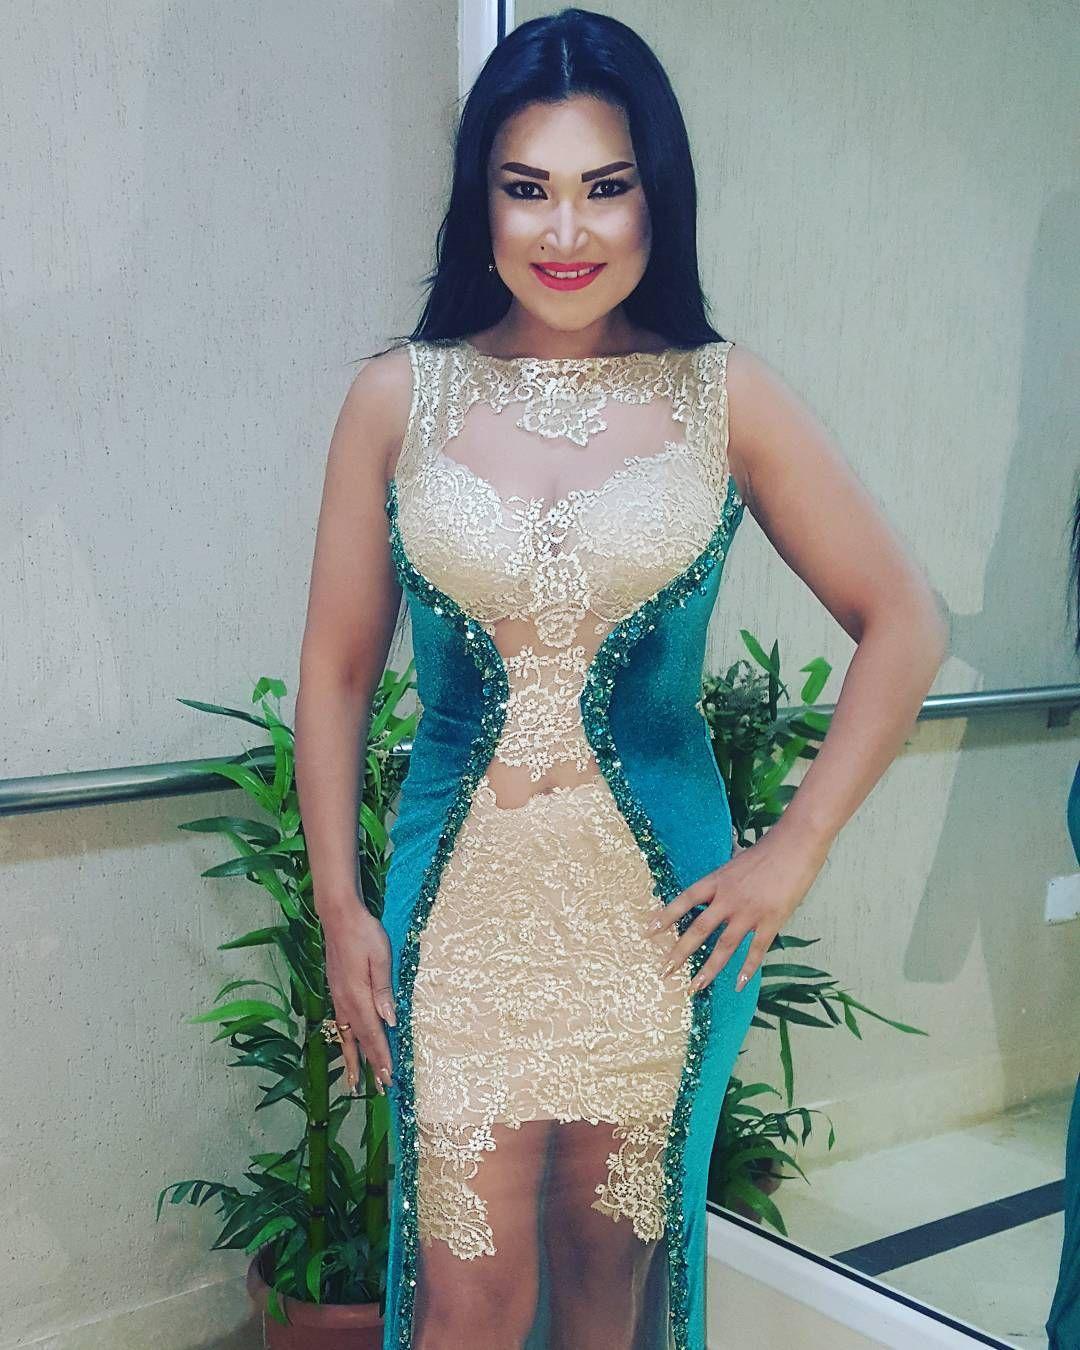 157 Mentions J Aime 7 Commentaires Najla Ettounsia نجلاء التونسية Officialnajlaettounsia Sur Instagram Bonj Dresses Formal Dresses Long Formal Dresses